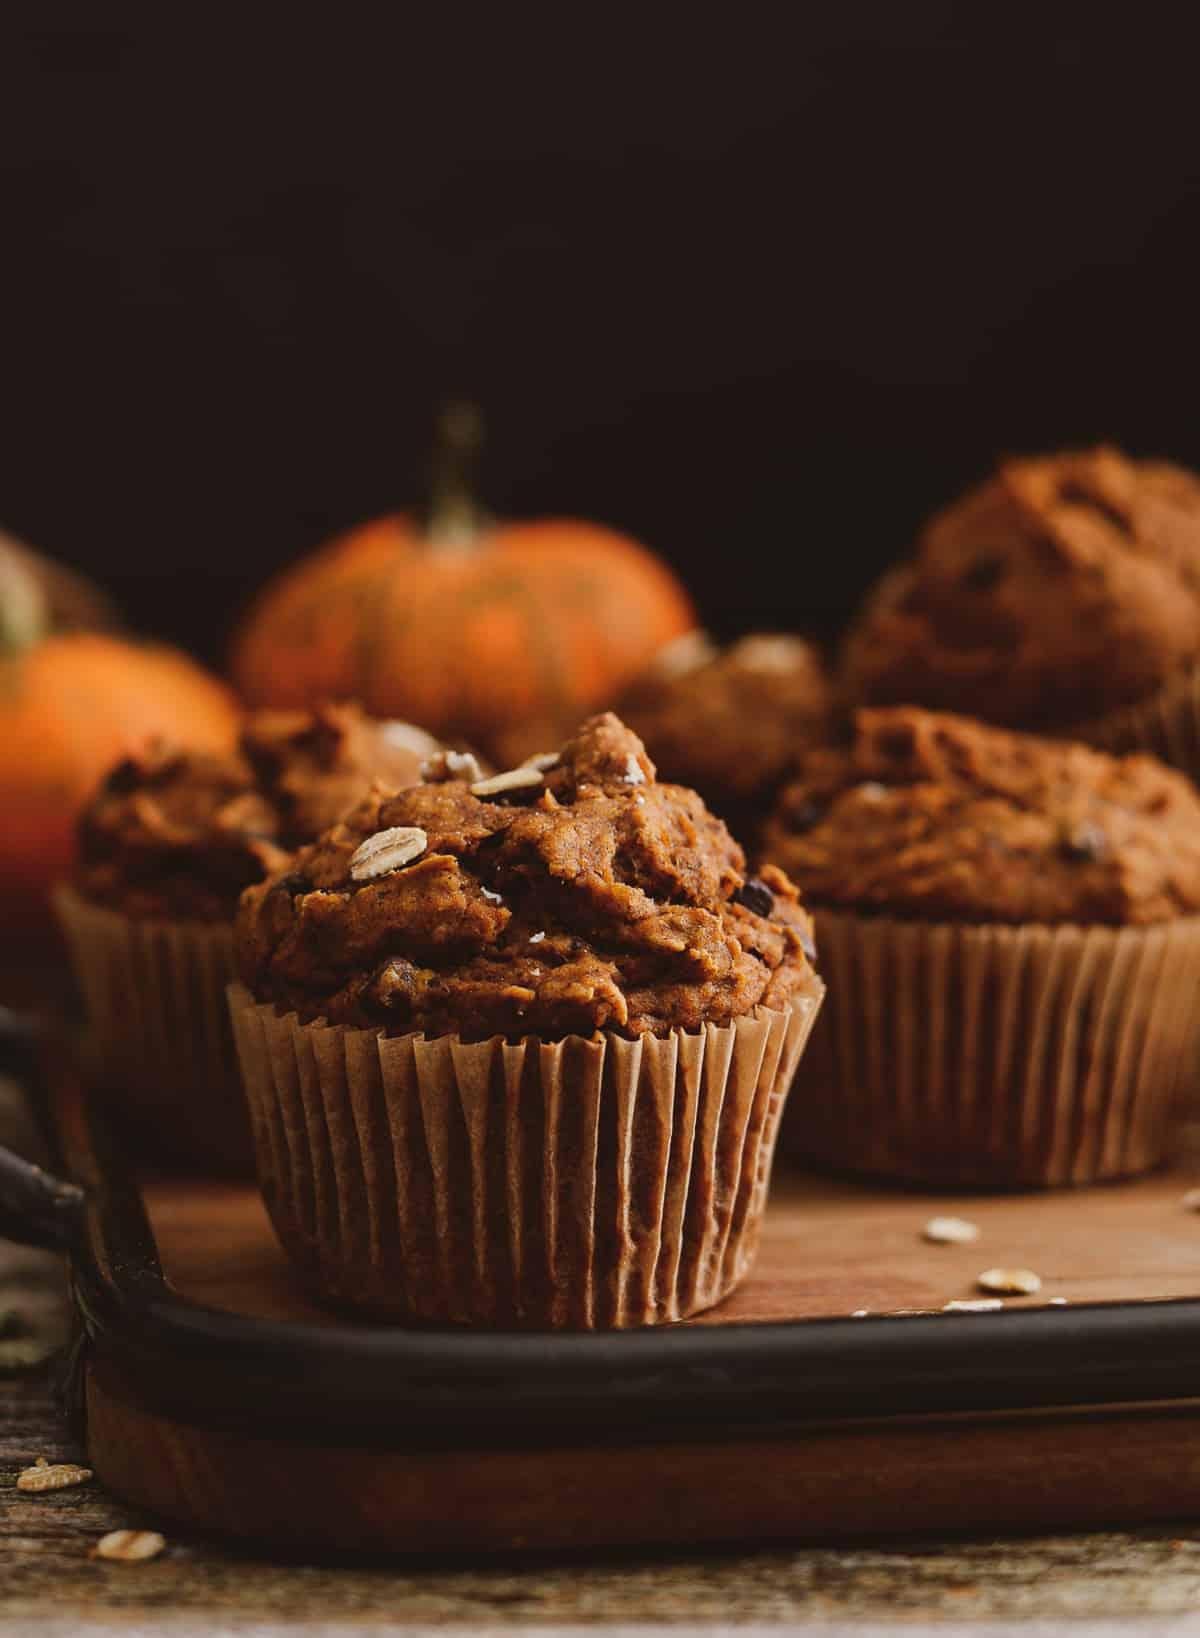 Vegan pumpkin muffins on tray.